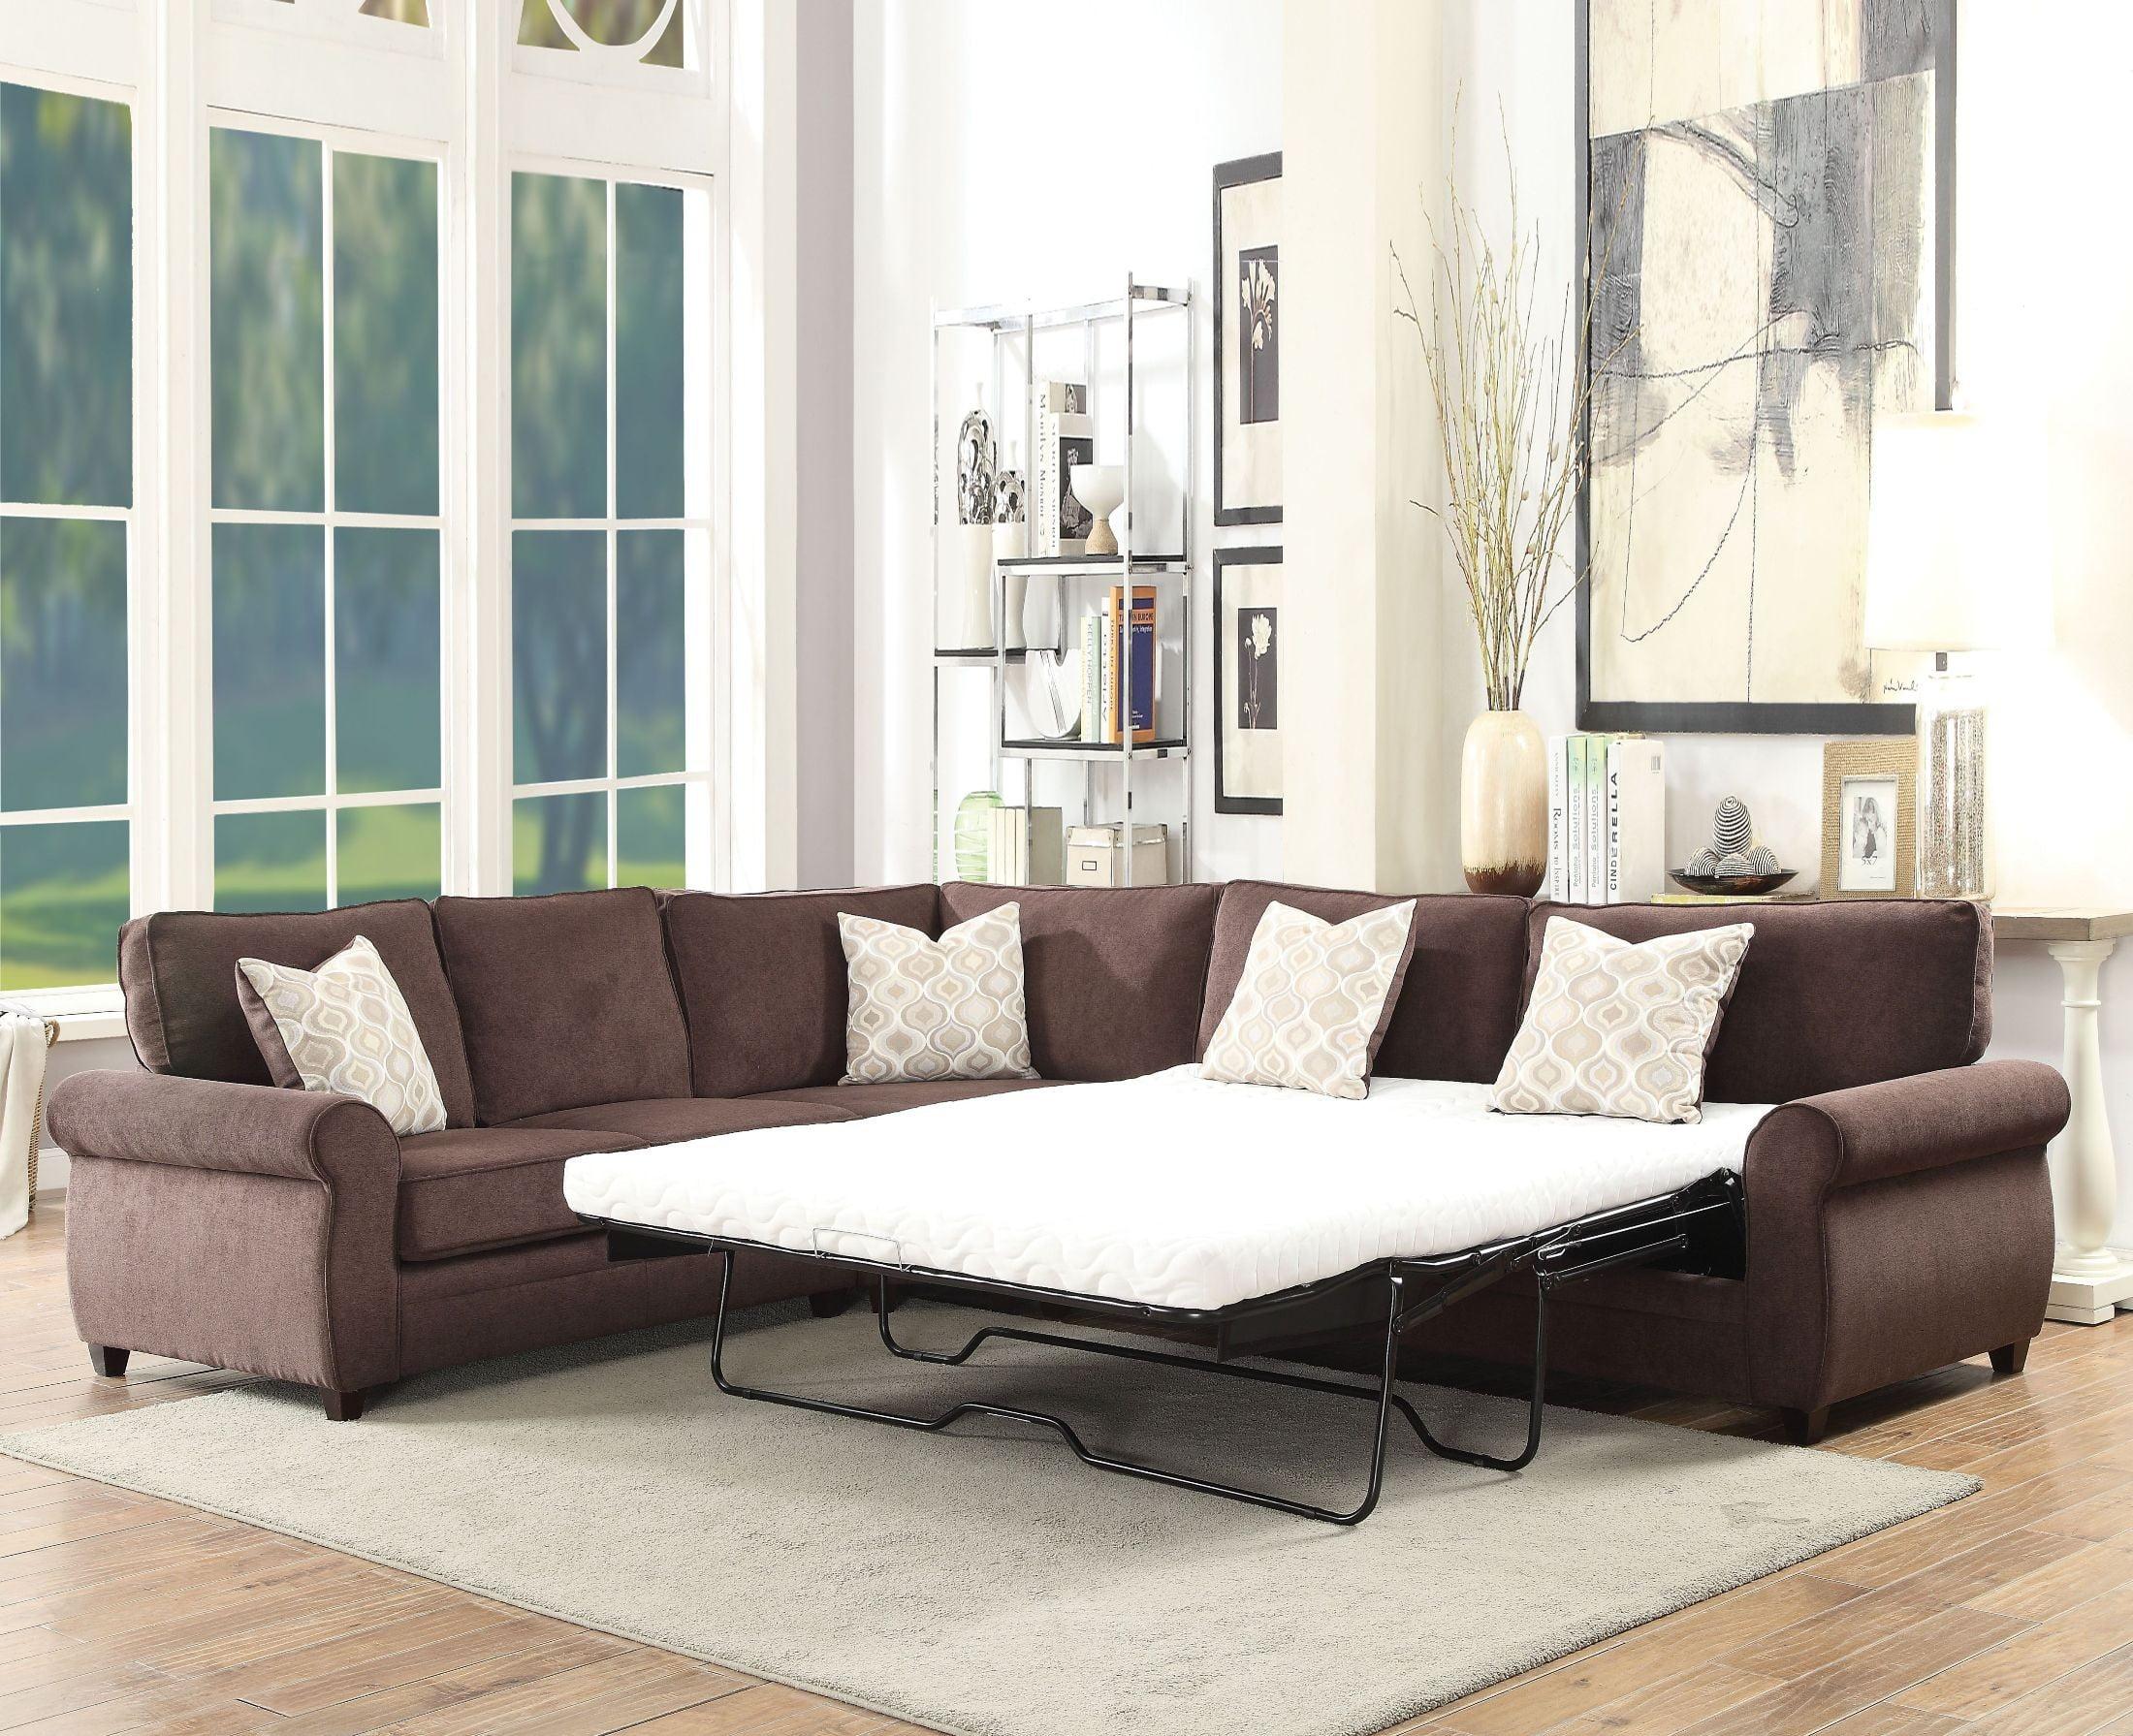 Randolph Chocolate Chenille Sectional Sofa Sleeper from Acme ...